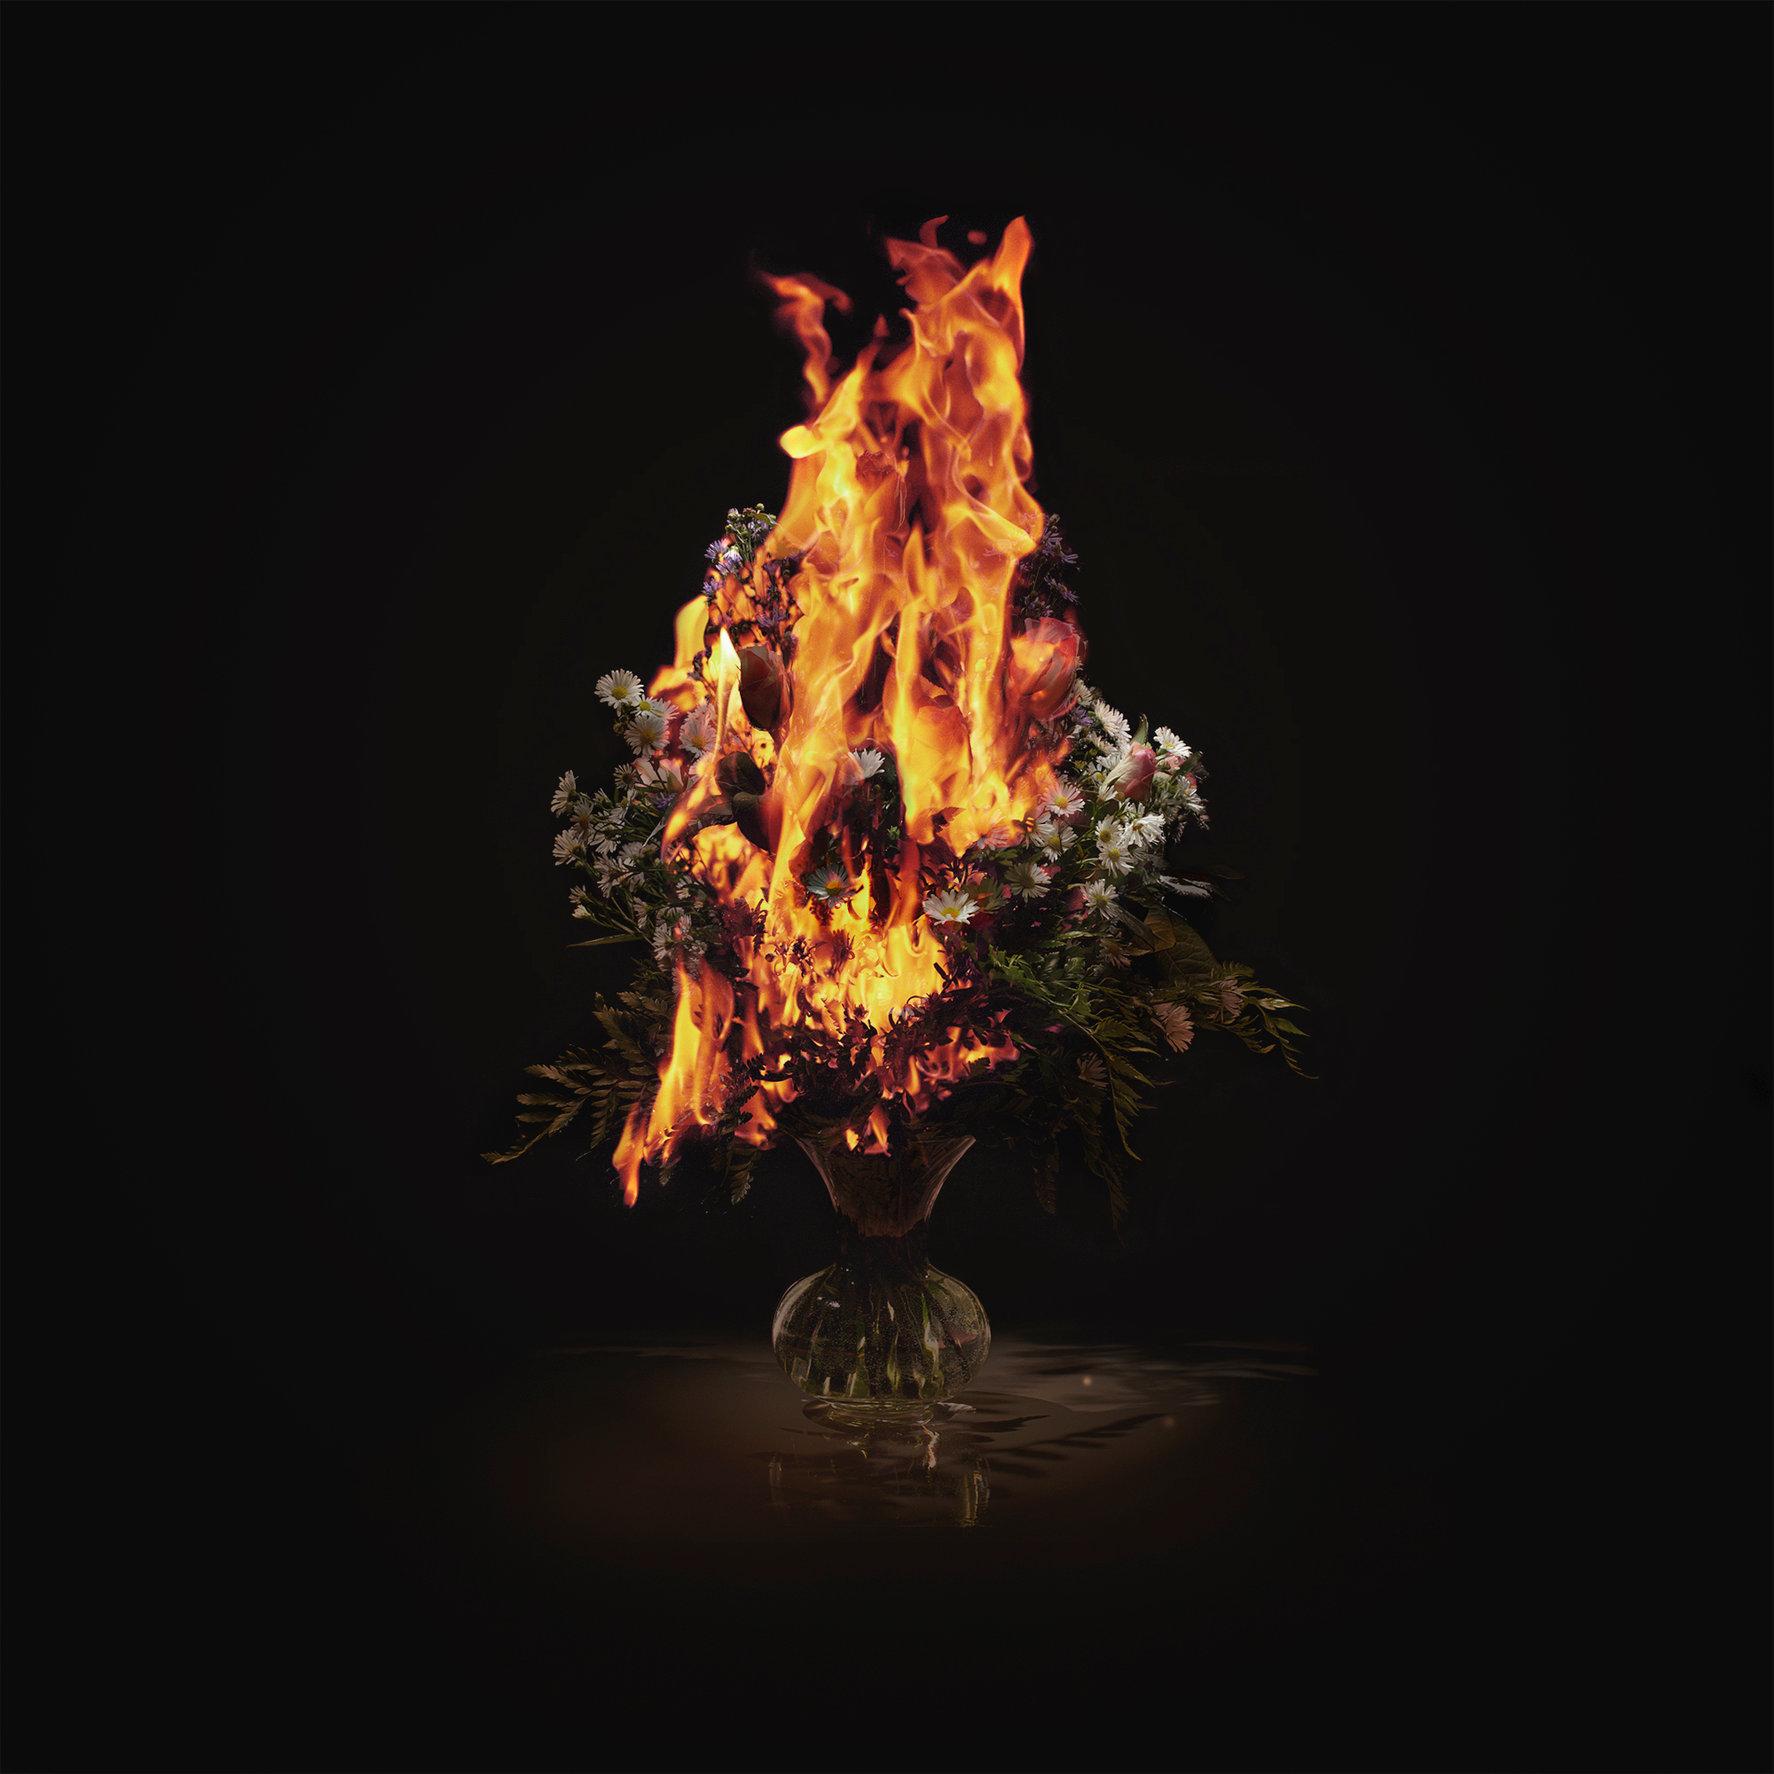 Burning Bouquet